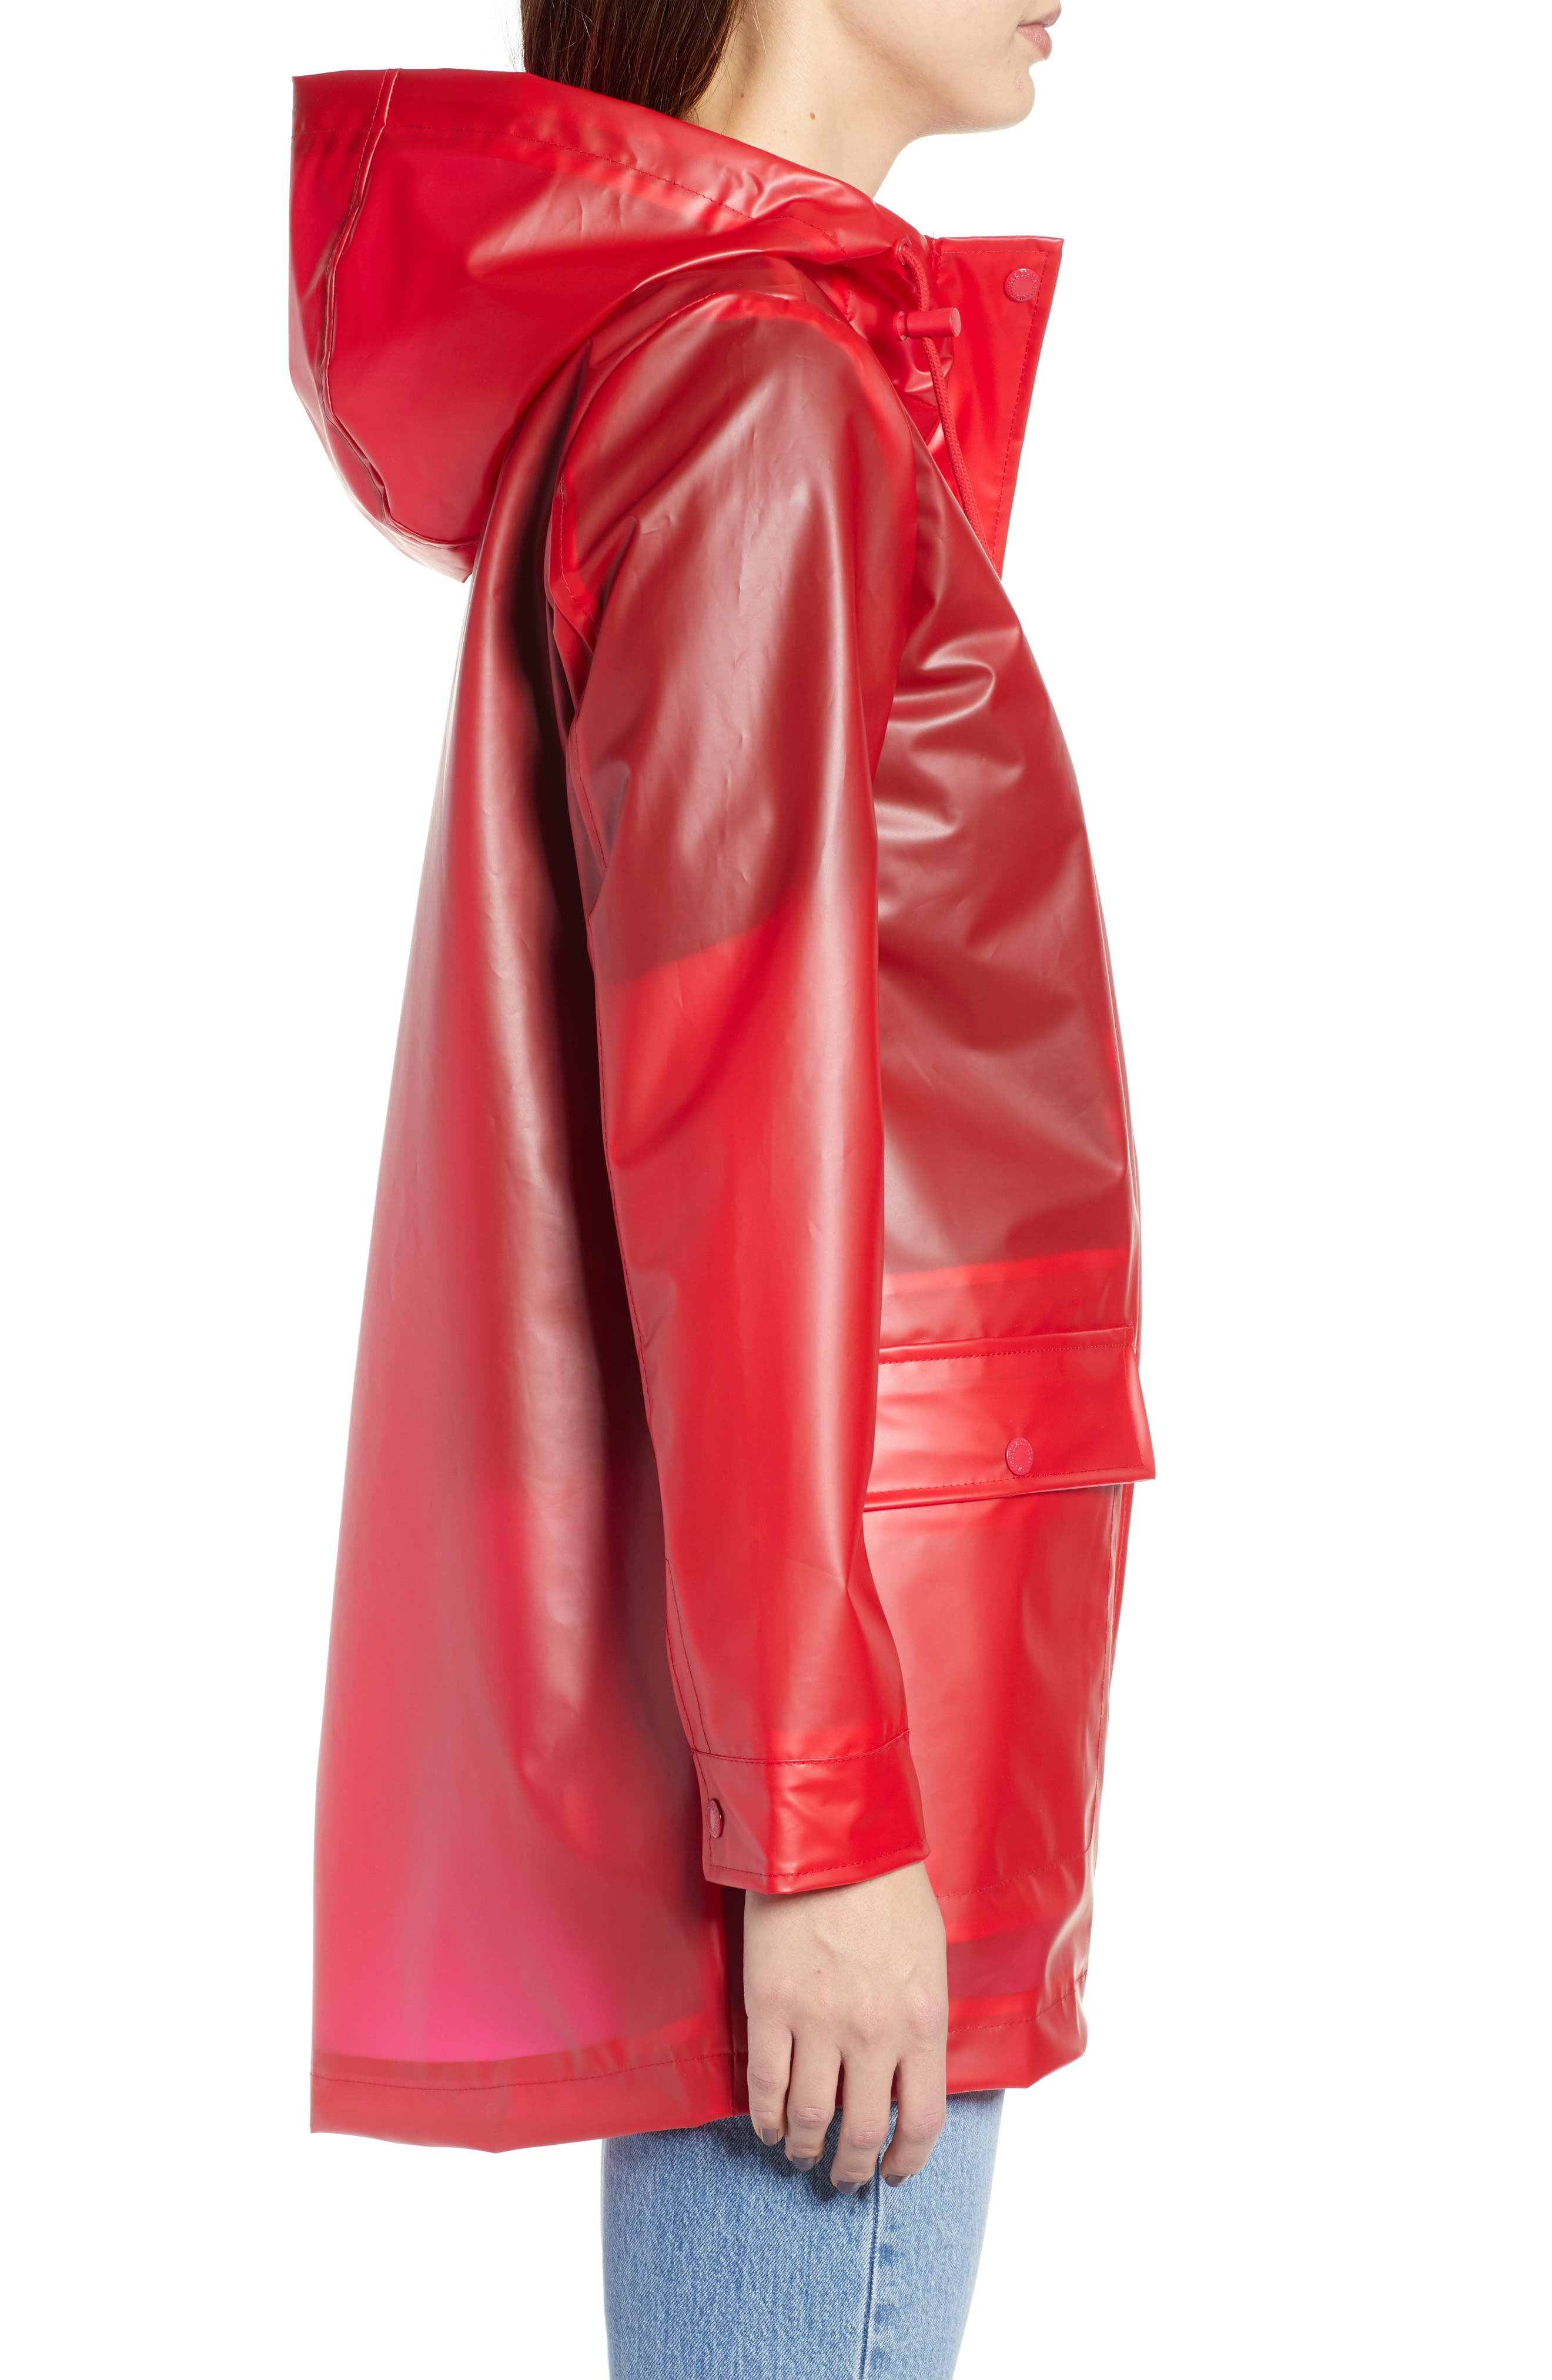 Translucent Rain Jacket,                             Alternate thumbnail 3, color,                             RED LYCHEE